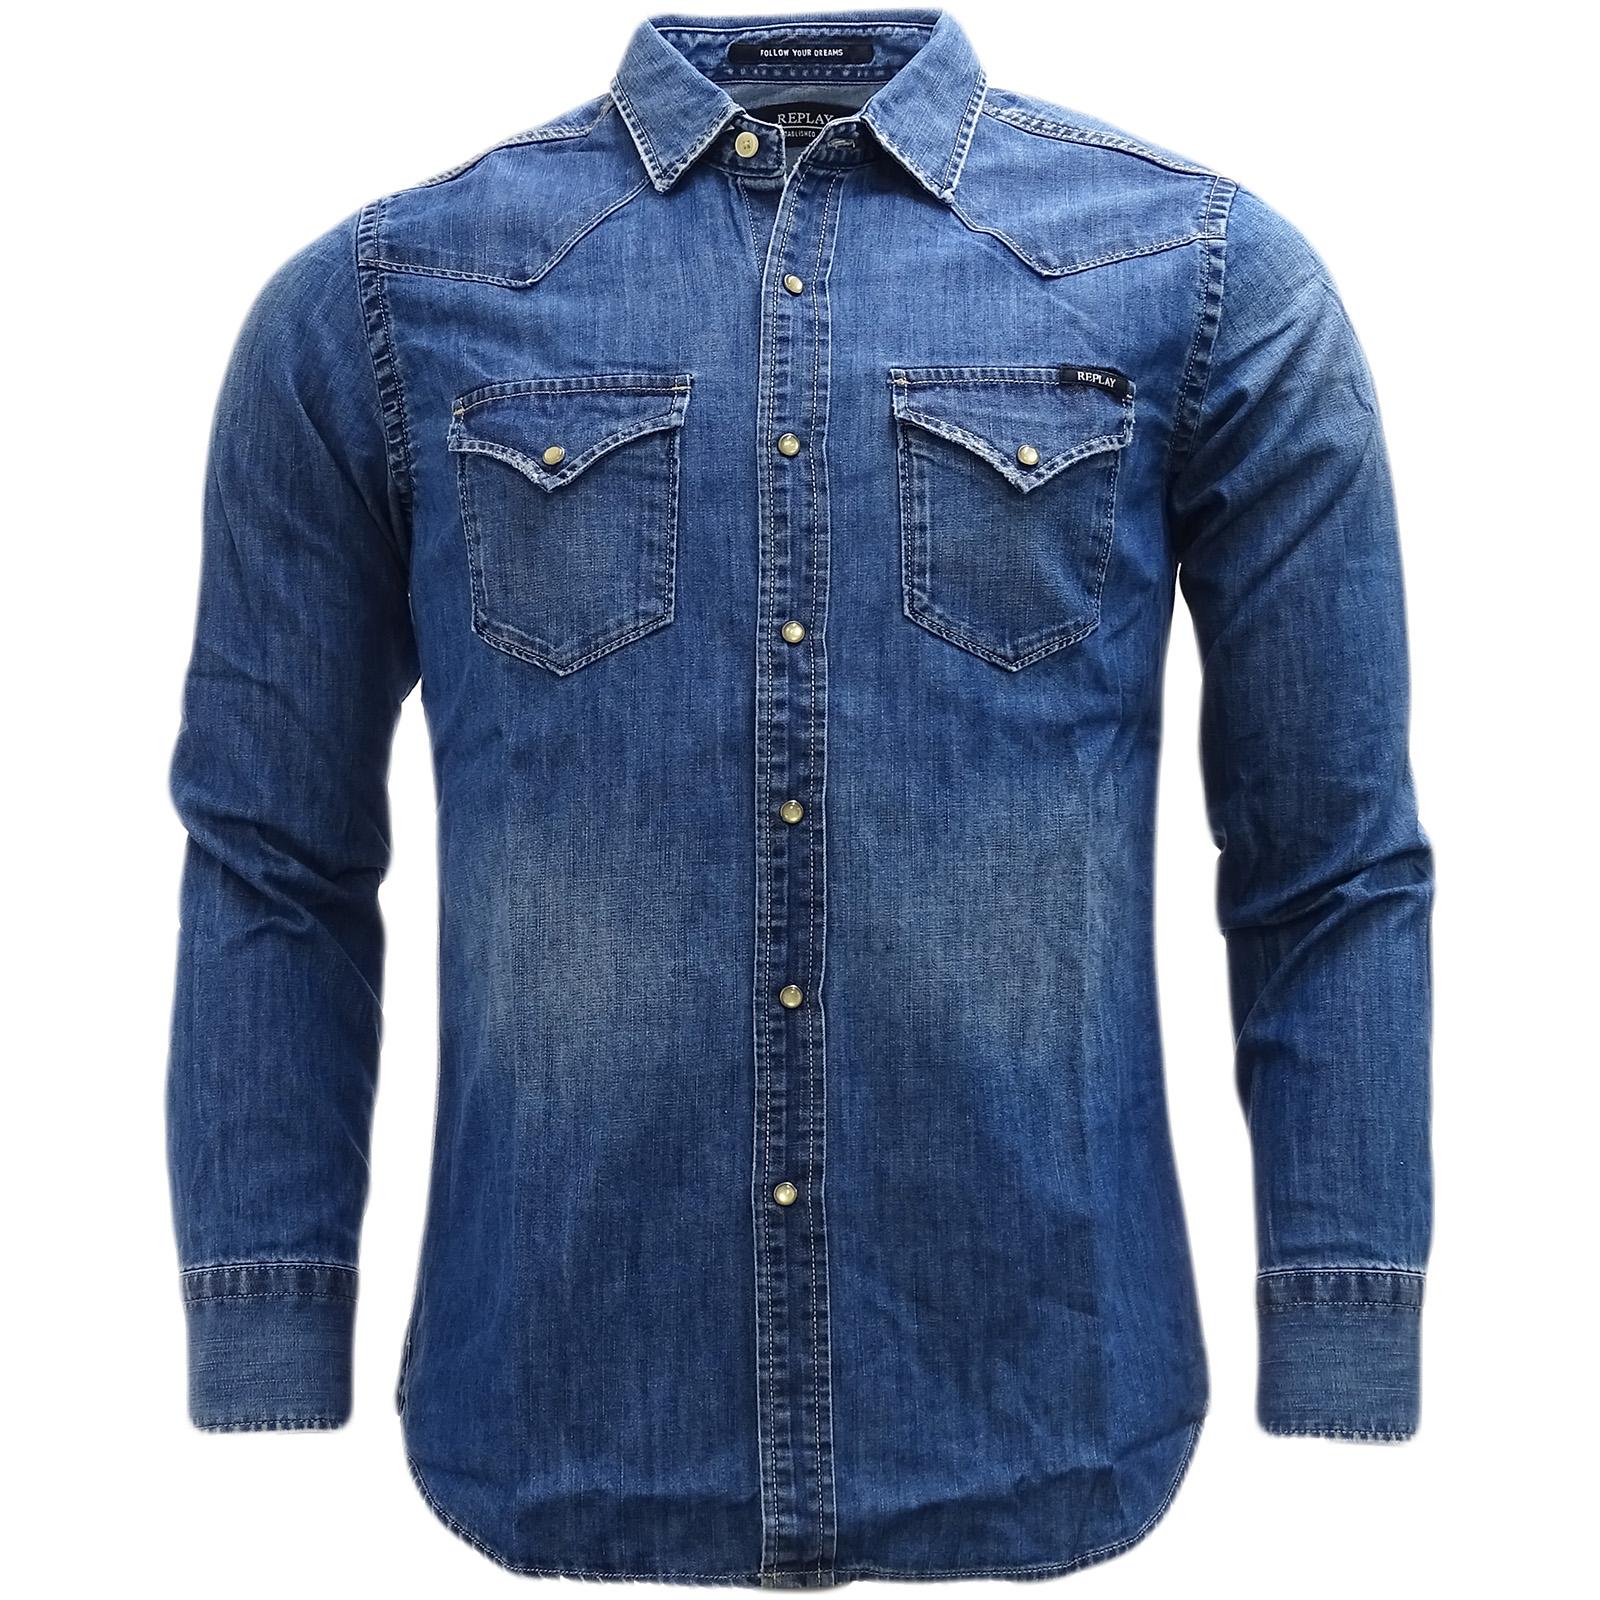 df59def8f6dd Details about Replay Blue Western Style Denim Shirt - M4860-009